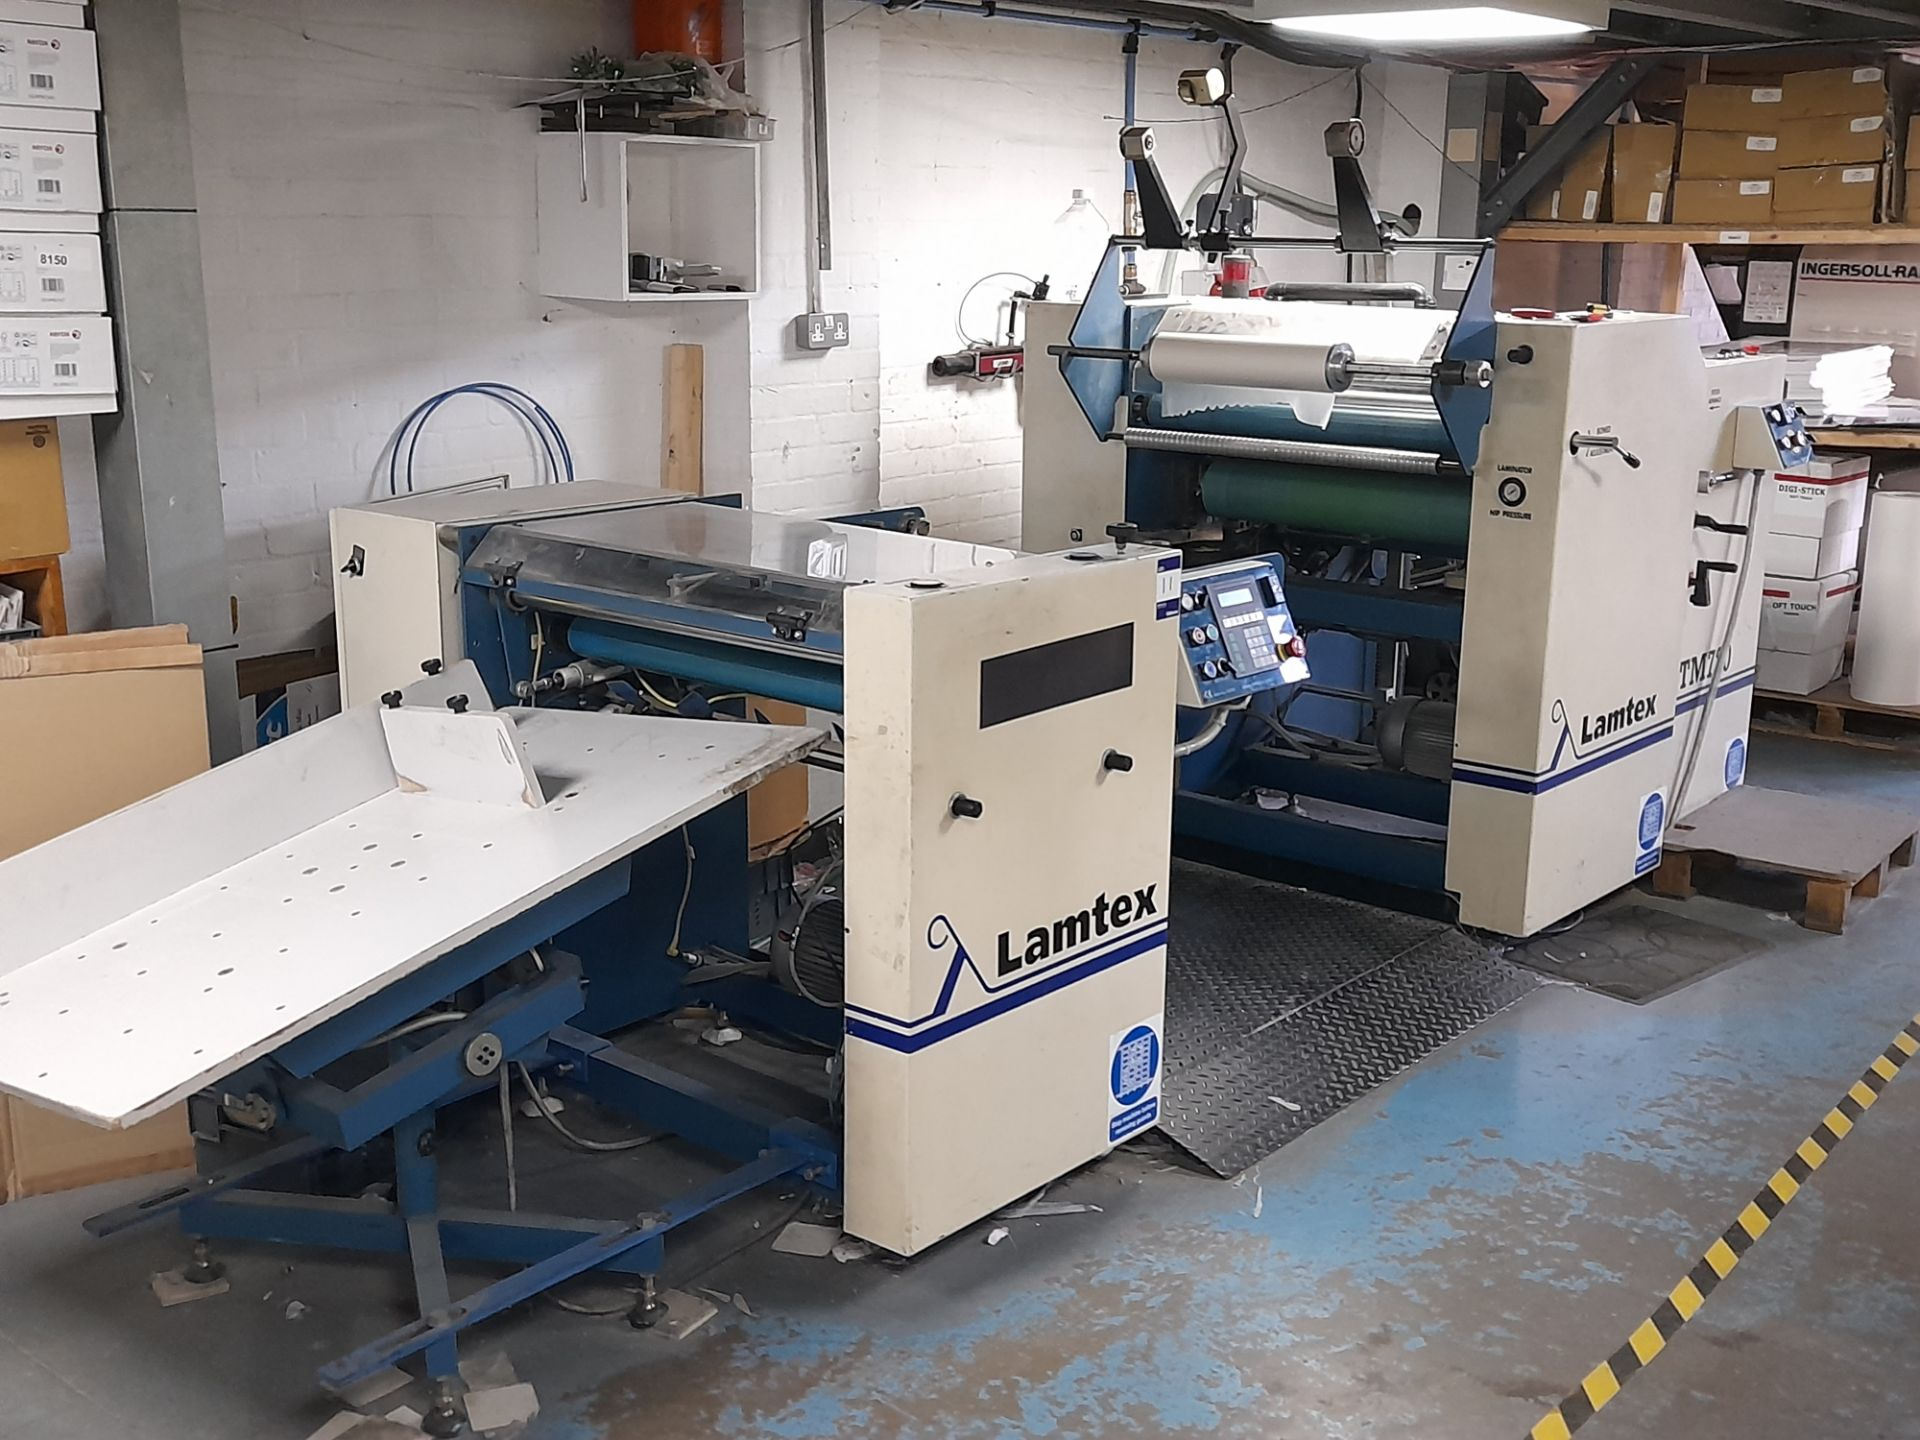 Lamtex TM820 laminator, with Tool Temp TT/142 chil